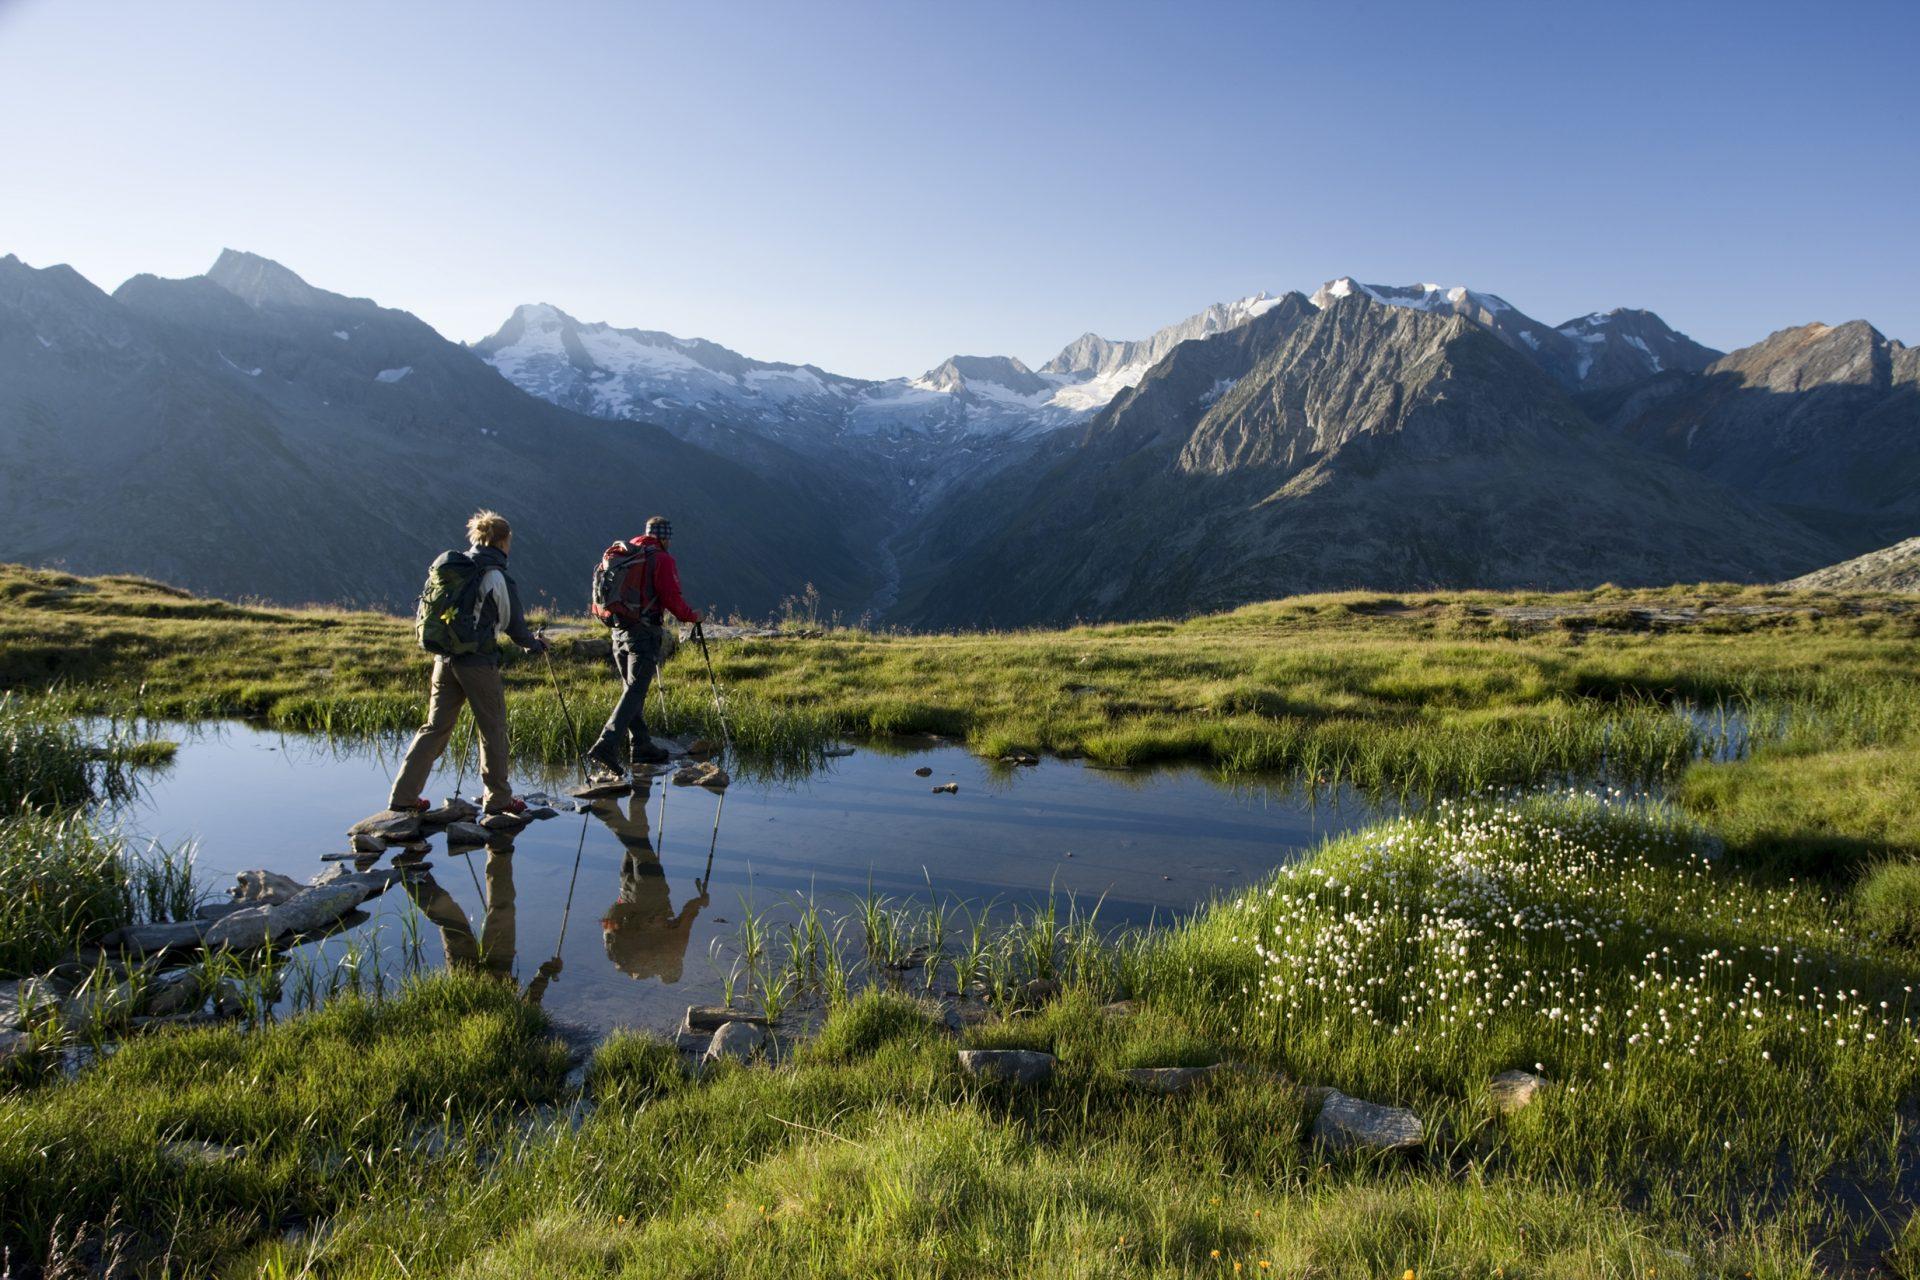 Wanderszene bei der Olpererhütte, Zillertaler Alpen, Tirol, Österreich.